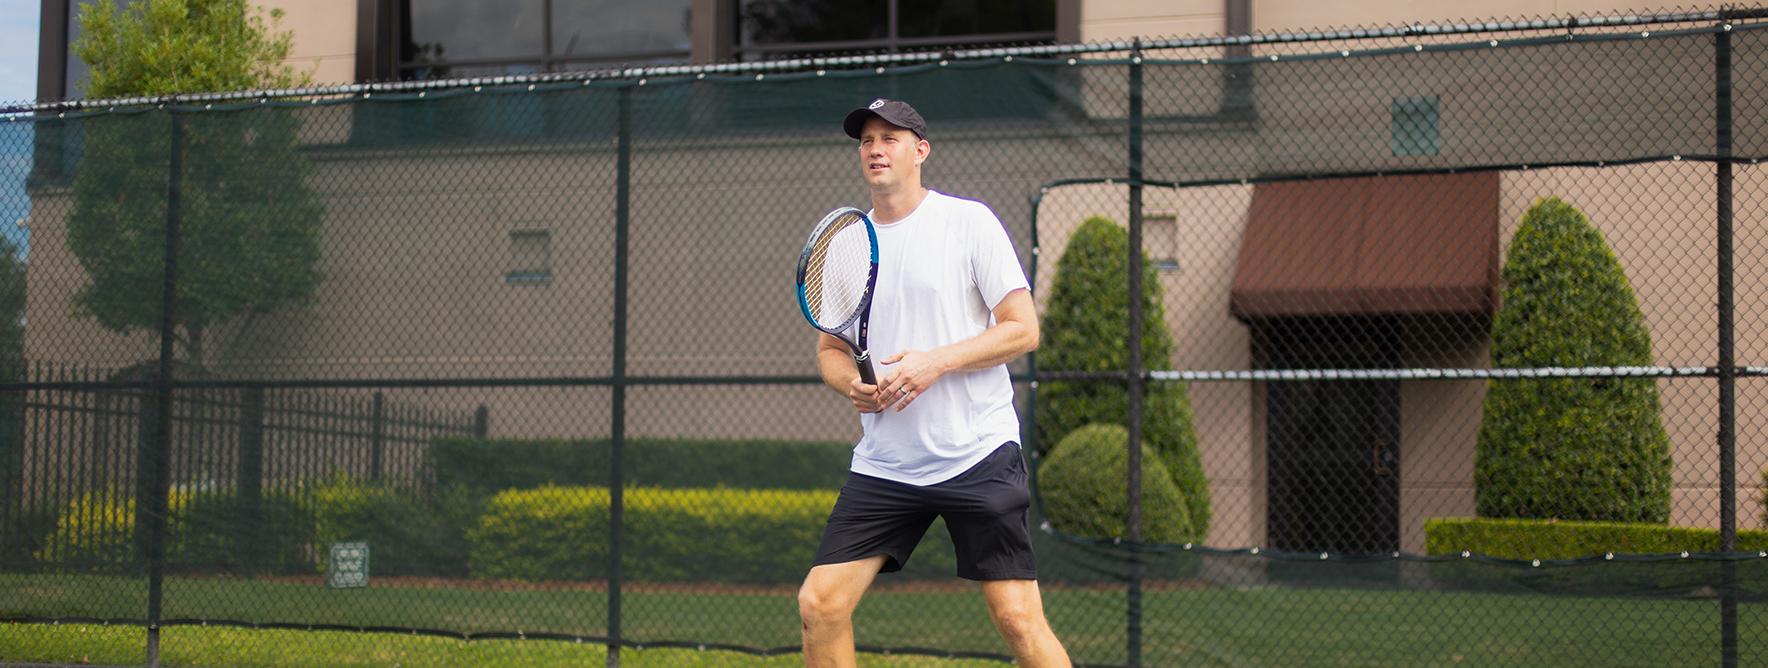 tasc performance - tennis clothing